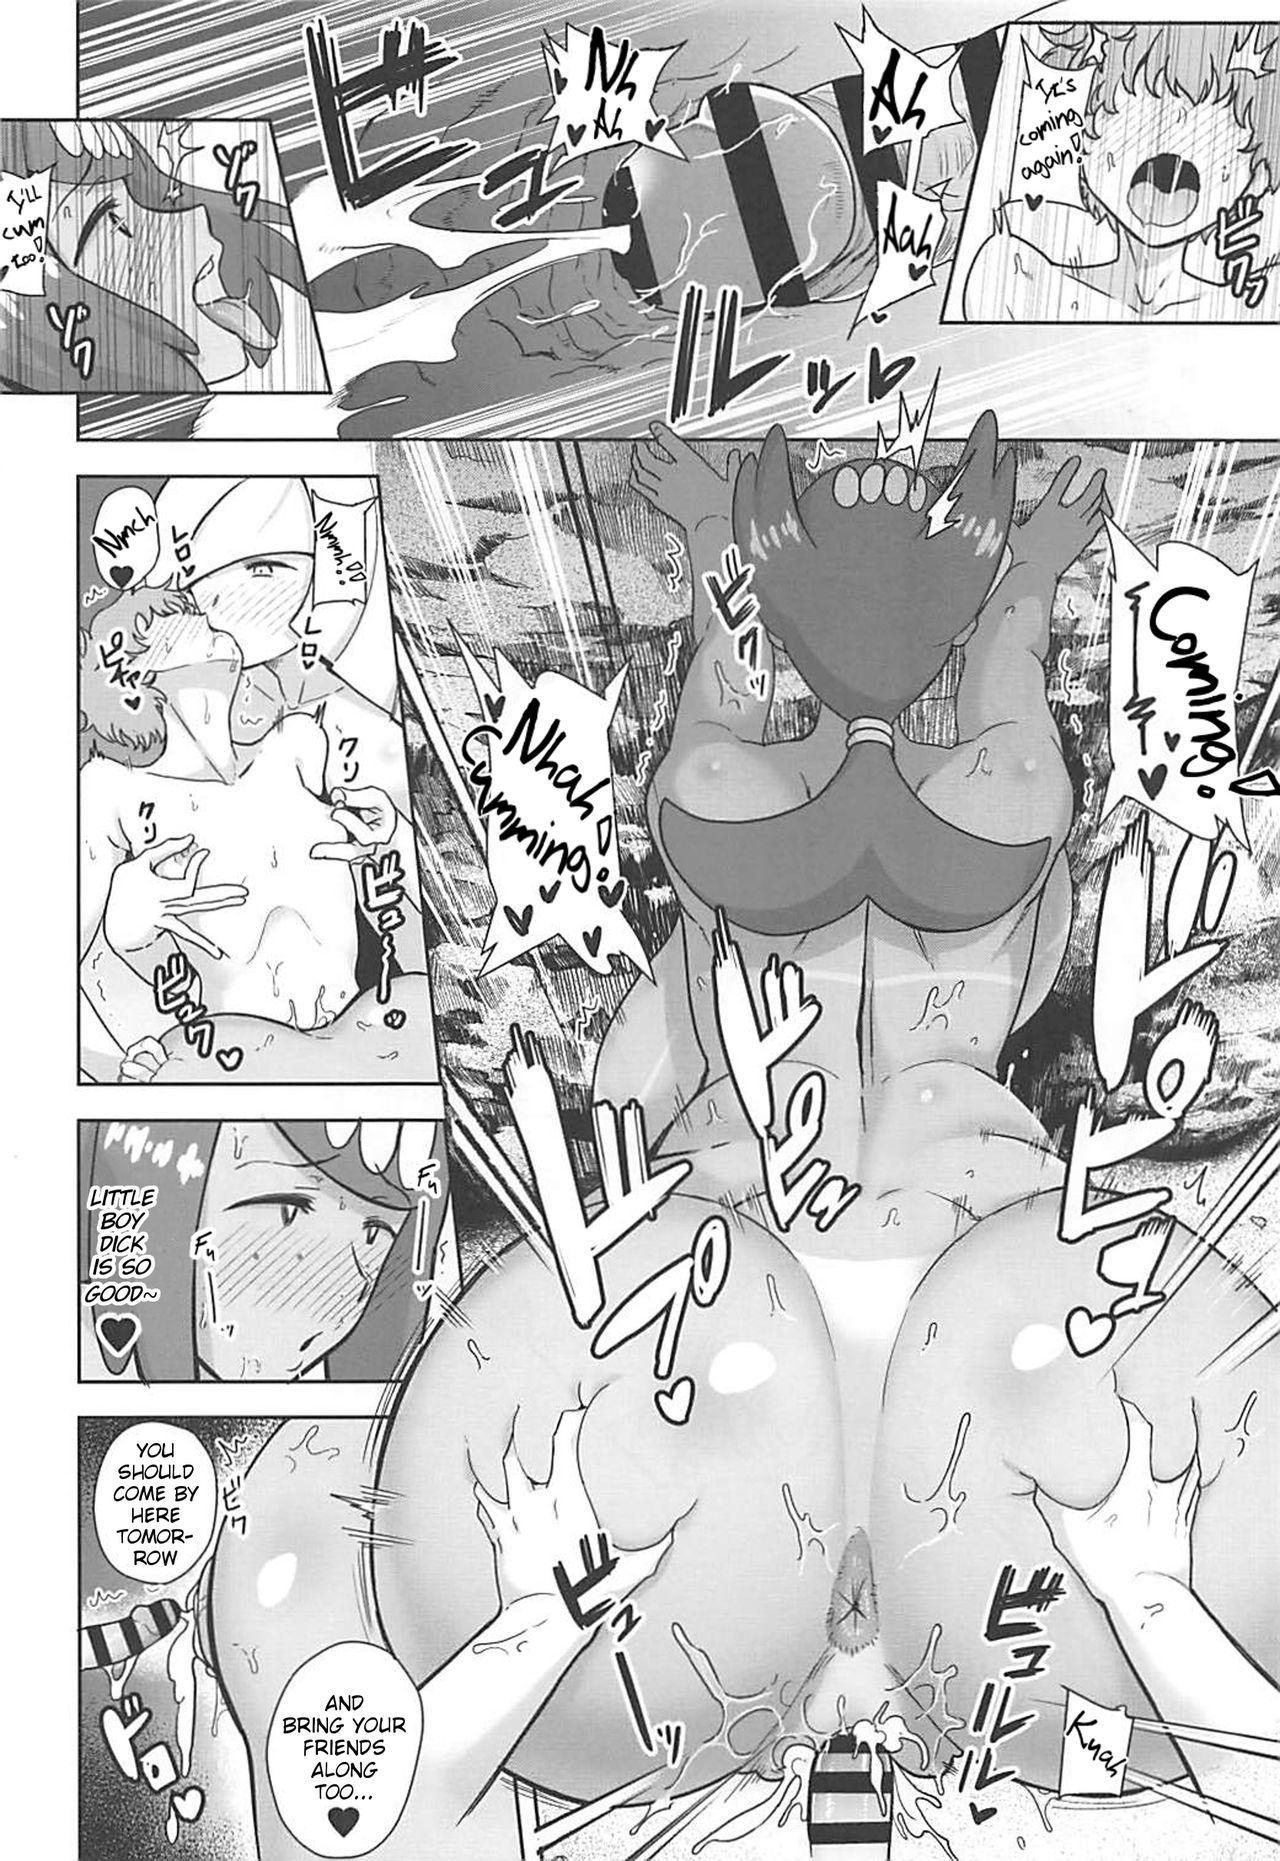 (SC2019 Spring) [DOLL PLAY (Kurosu Gatari)] Alola no Yoru no Sugata 3 (Pokémon Sun and Moon)   The Feeling of Alolan Night 3 [English] [Learn JP With H] 8